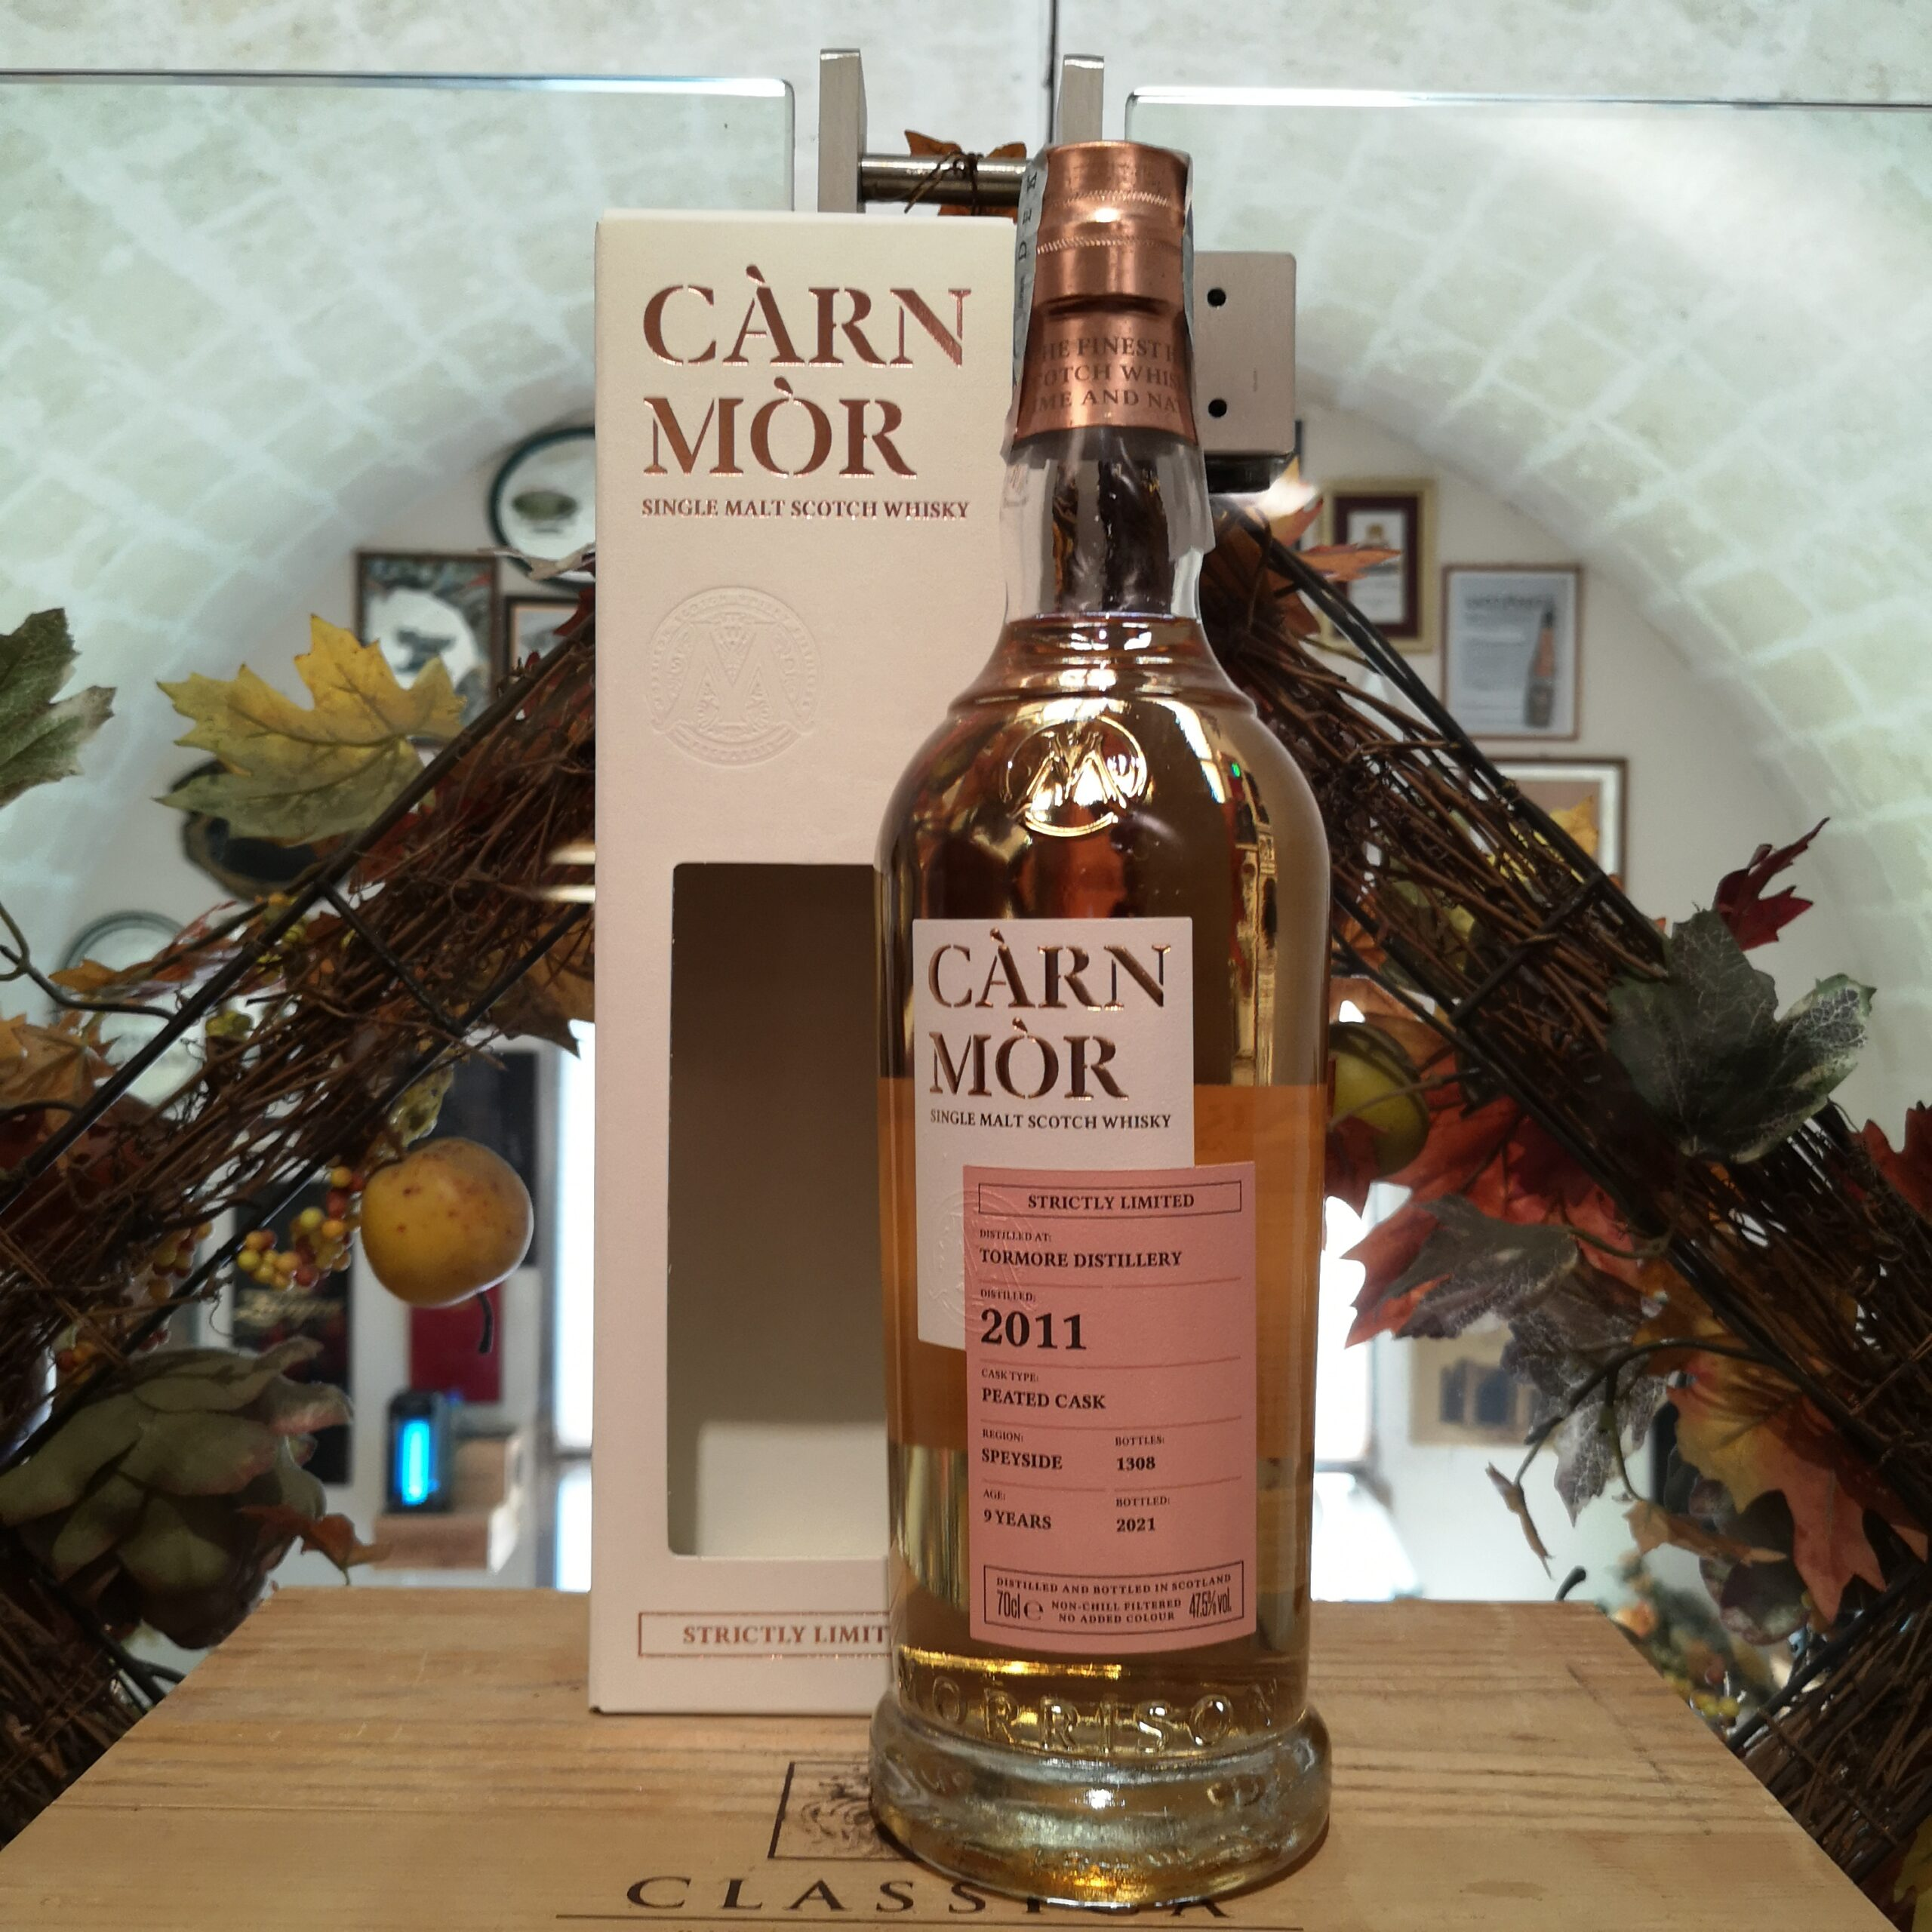 Càrn Mòr Strictly Limited Tormore Single Malt Scotch Whisky 2011 9 YO